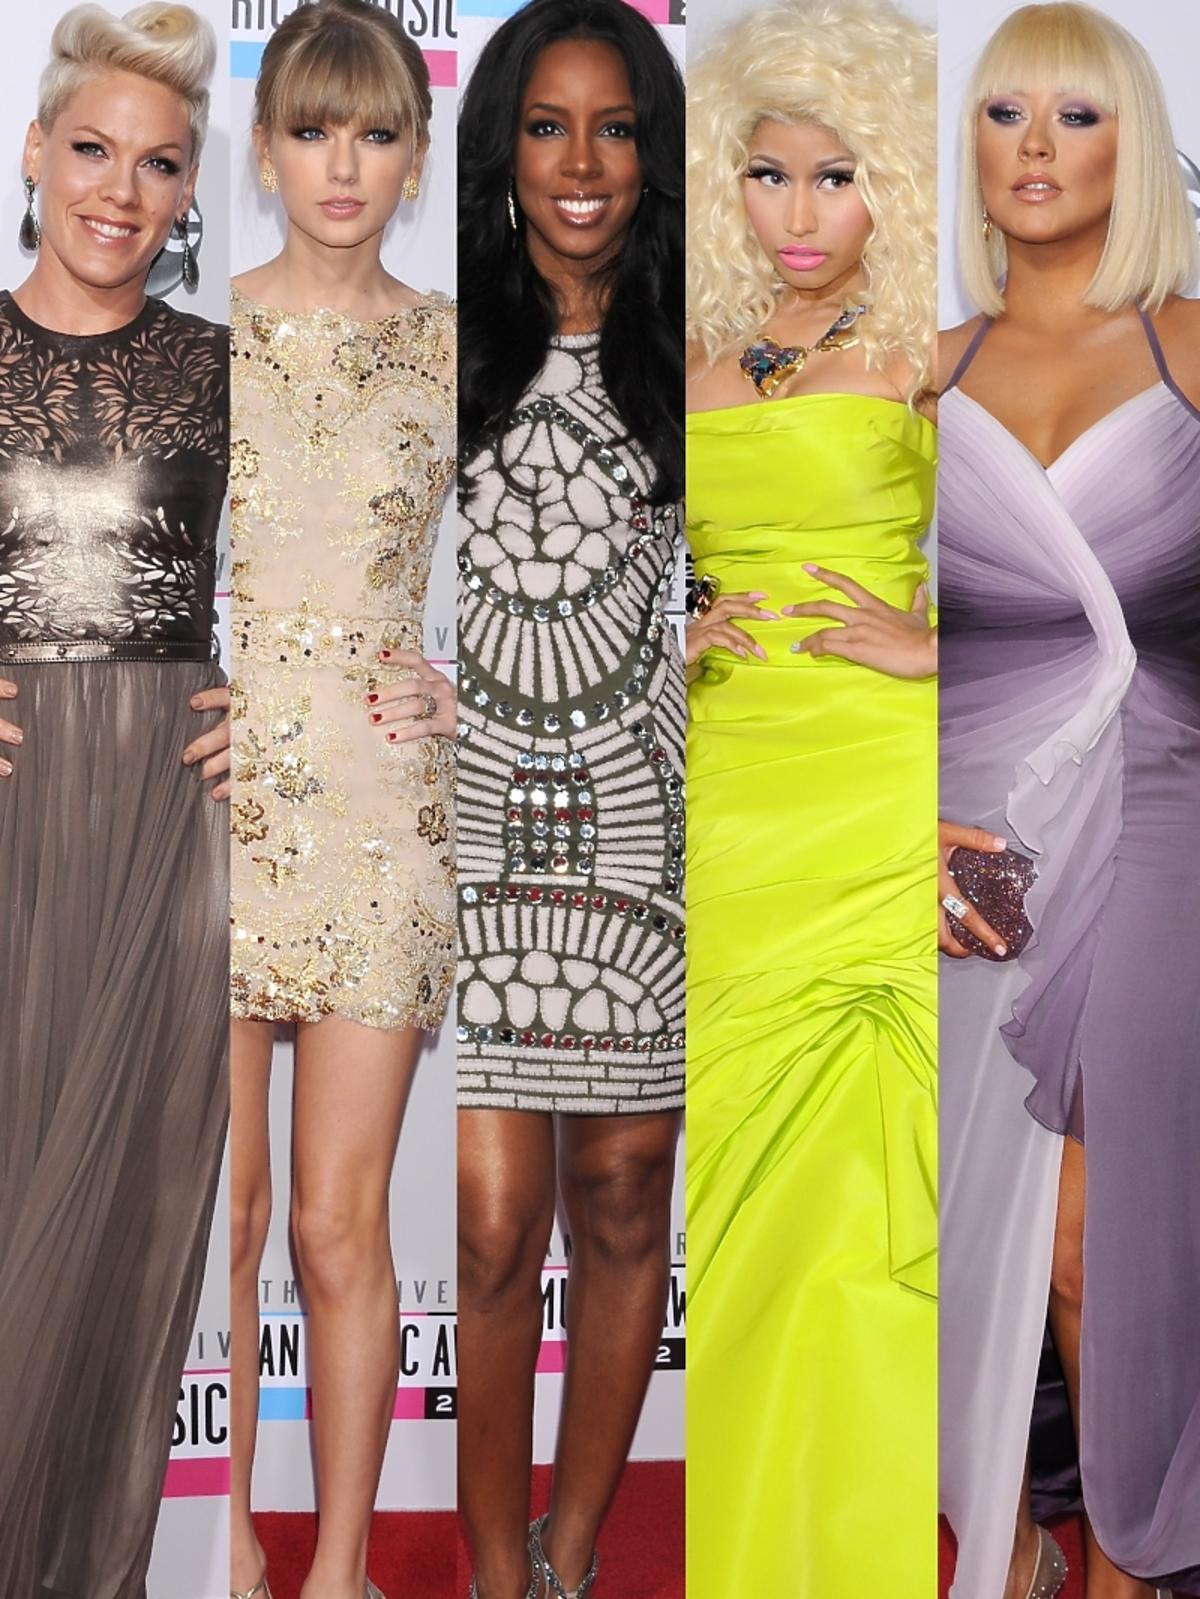 Gwiazdy na rozdaniu nagród American Music Awards